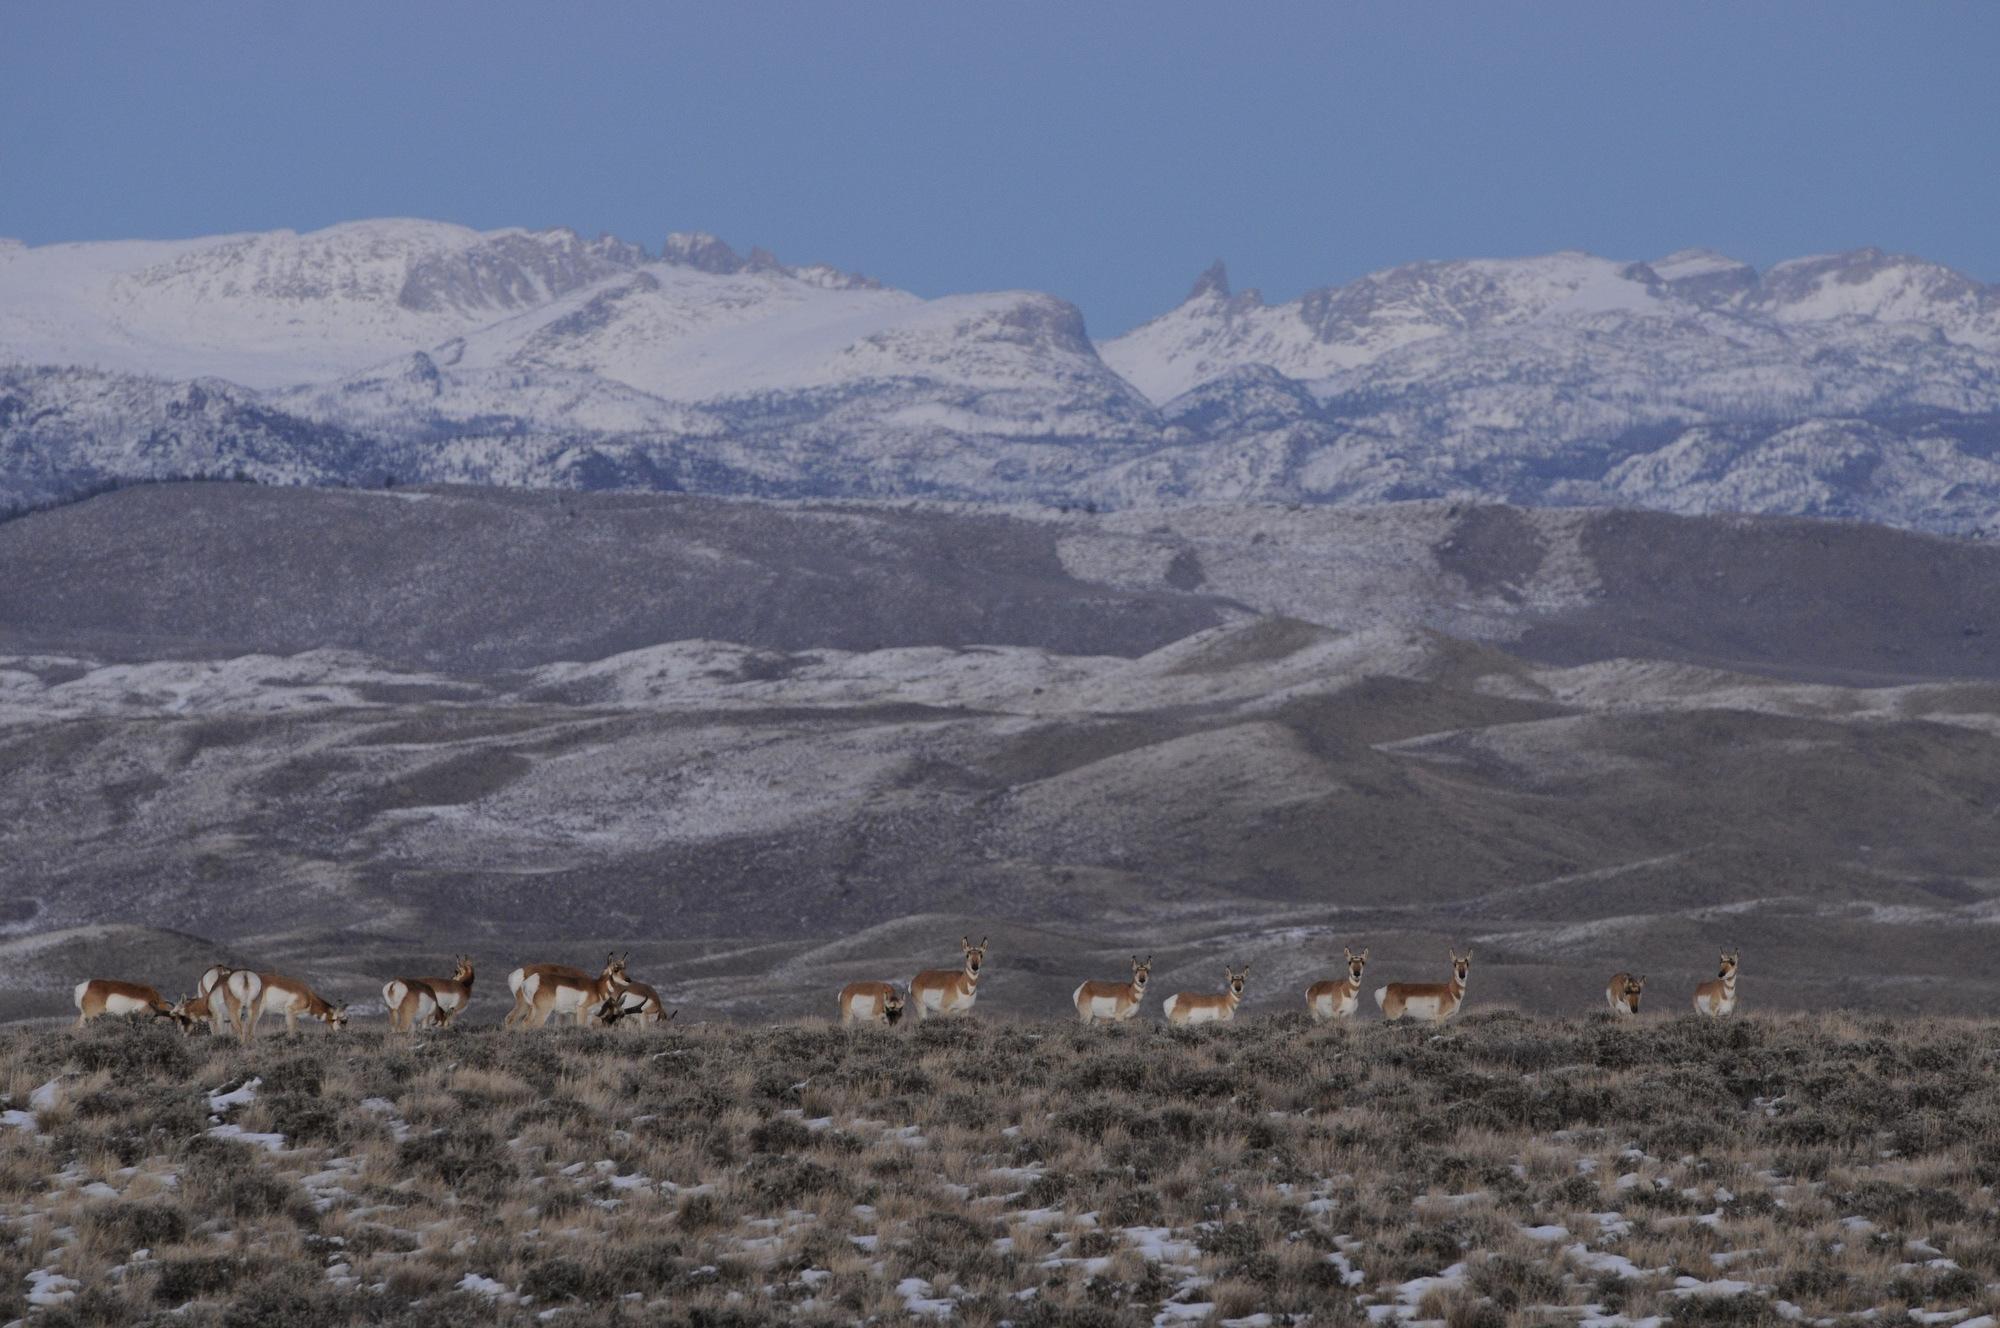 Pronghorn in winter range